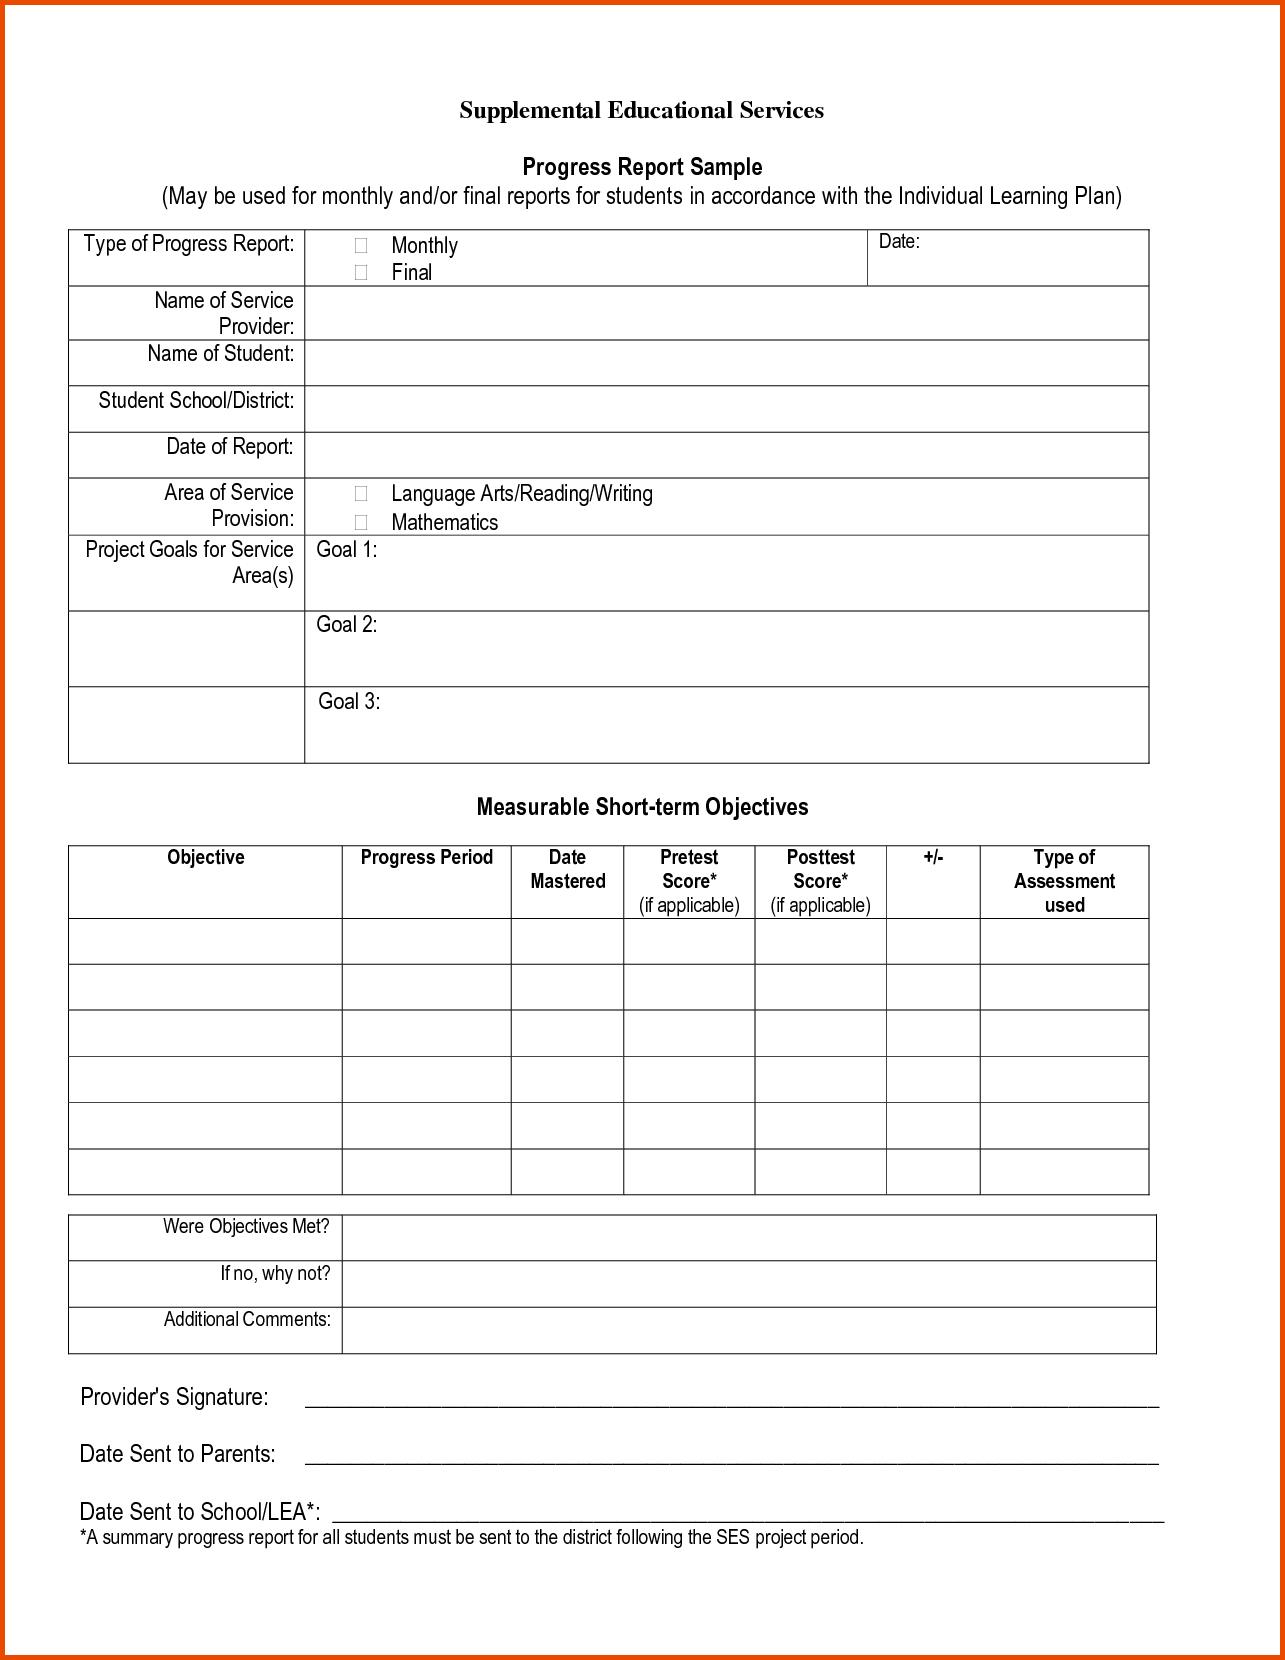 Pinmaricarl Carranza On Sample Progress Report  Progress Report For School Progress Report Template